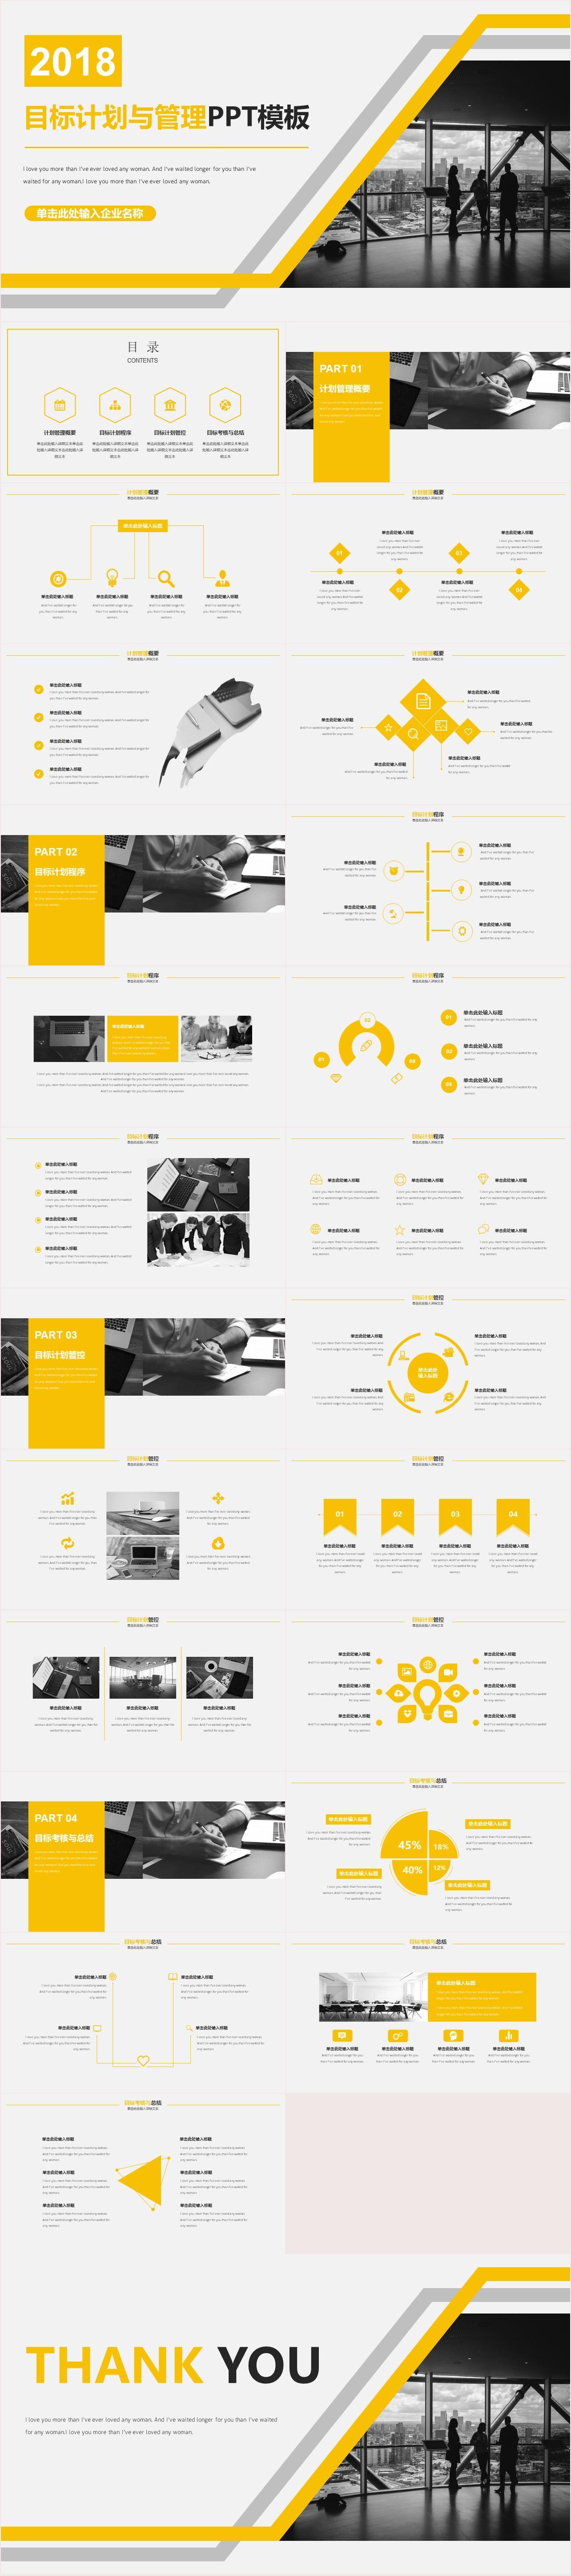 VC0159 黄色商务高端大气目标计划与管理PPT模板